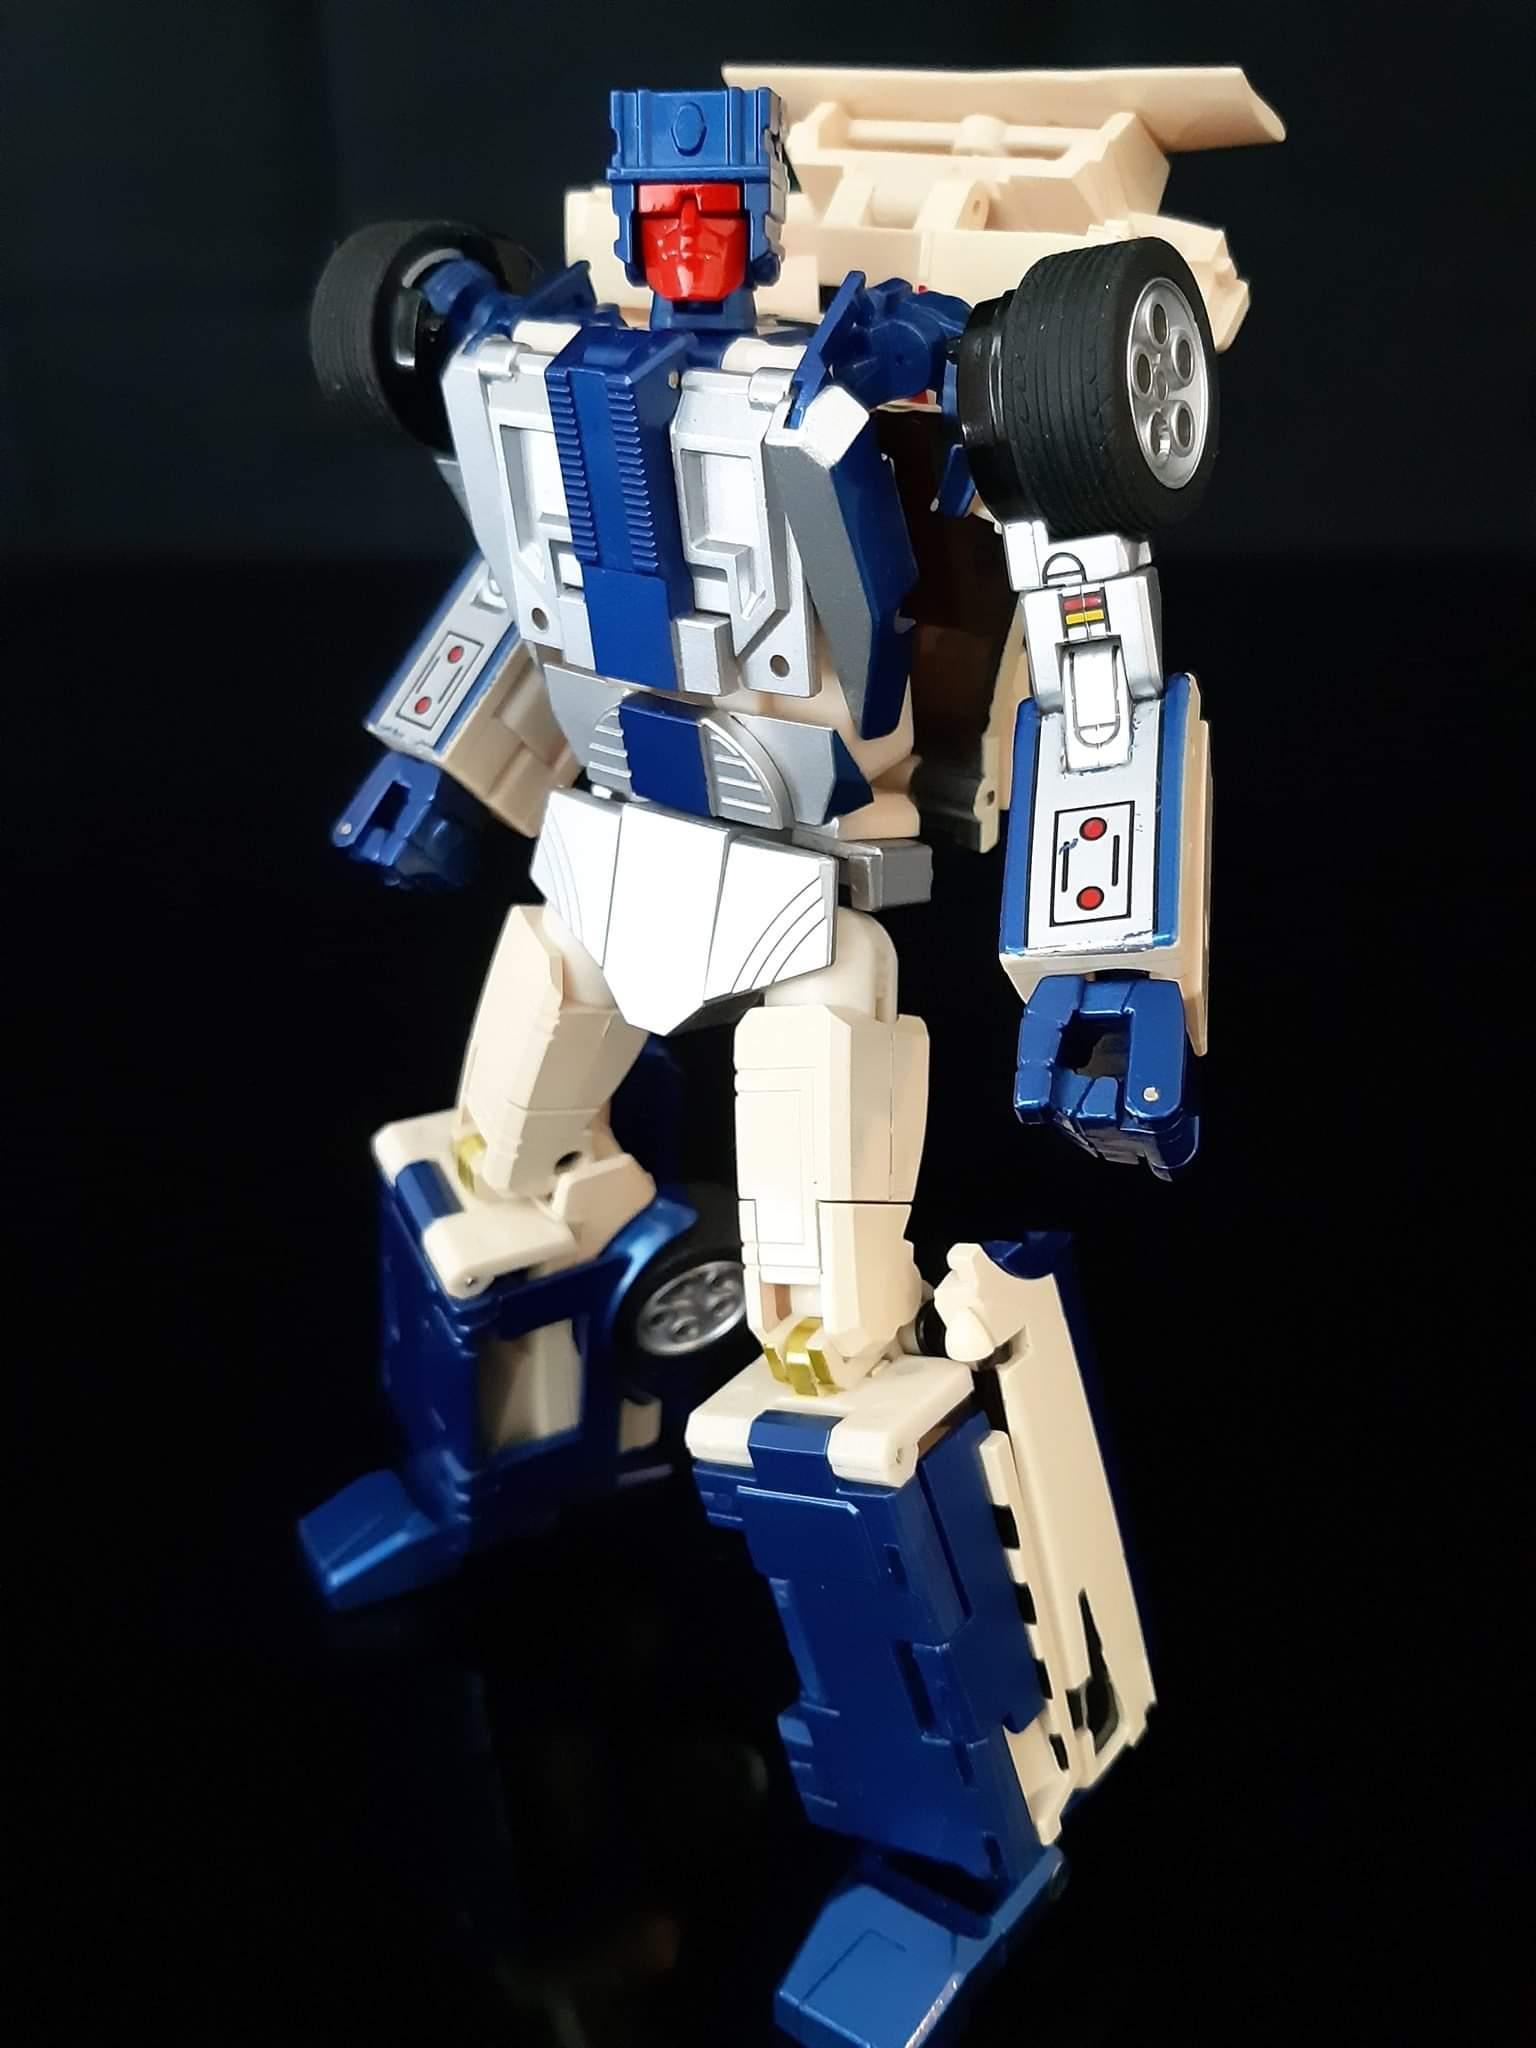 [X-Transbots] Produit Tiers - Jouets Berserkars forme Monolith (MX-XIII à MX-VII) - aka Stunticons forme Menasor/Menaseur - Page 6 B3GZRvHC_o